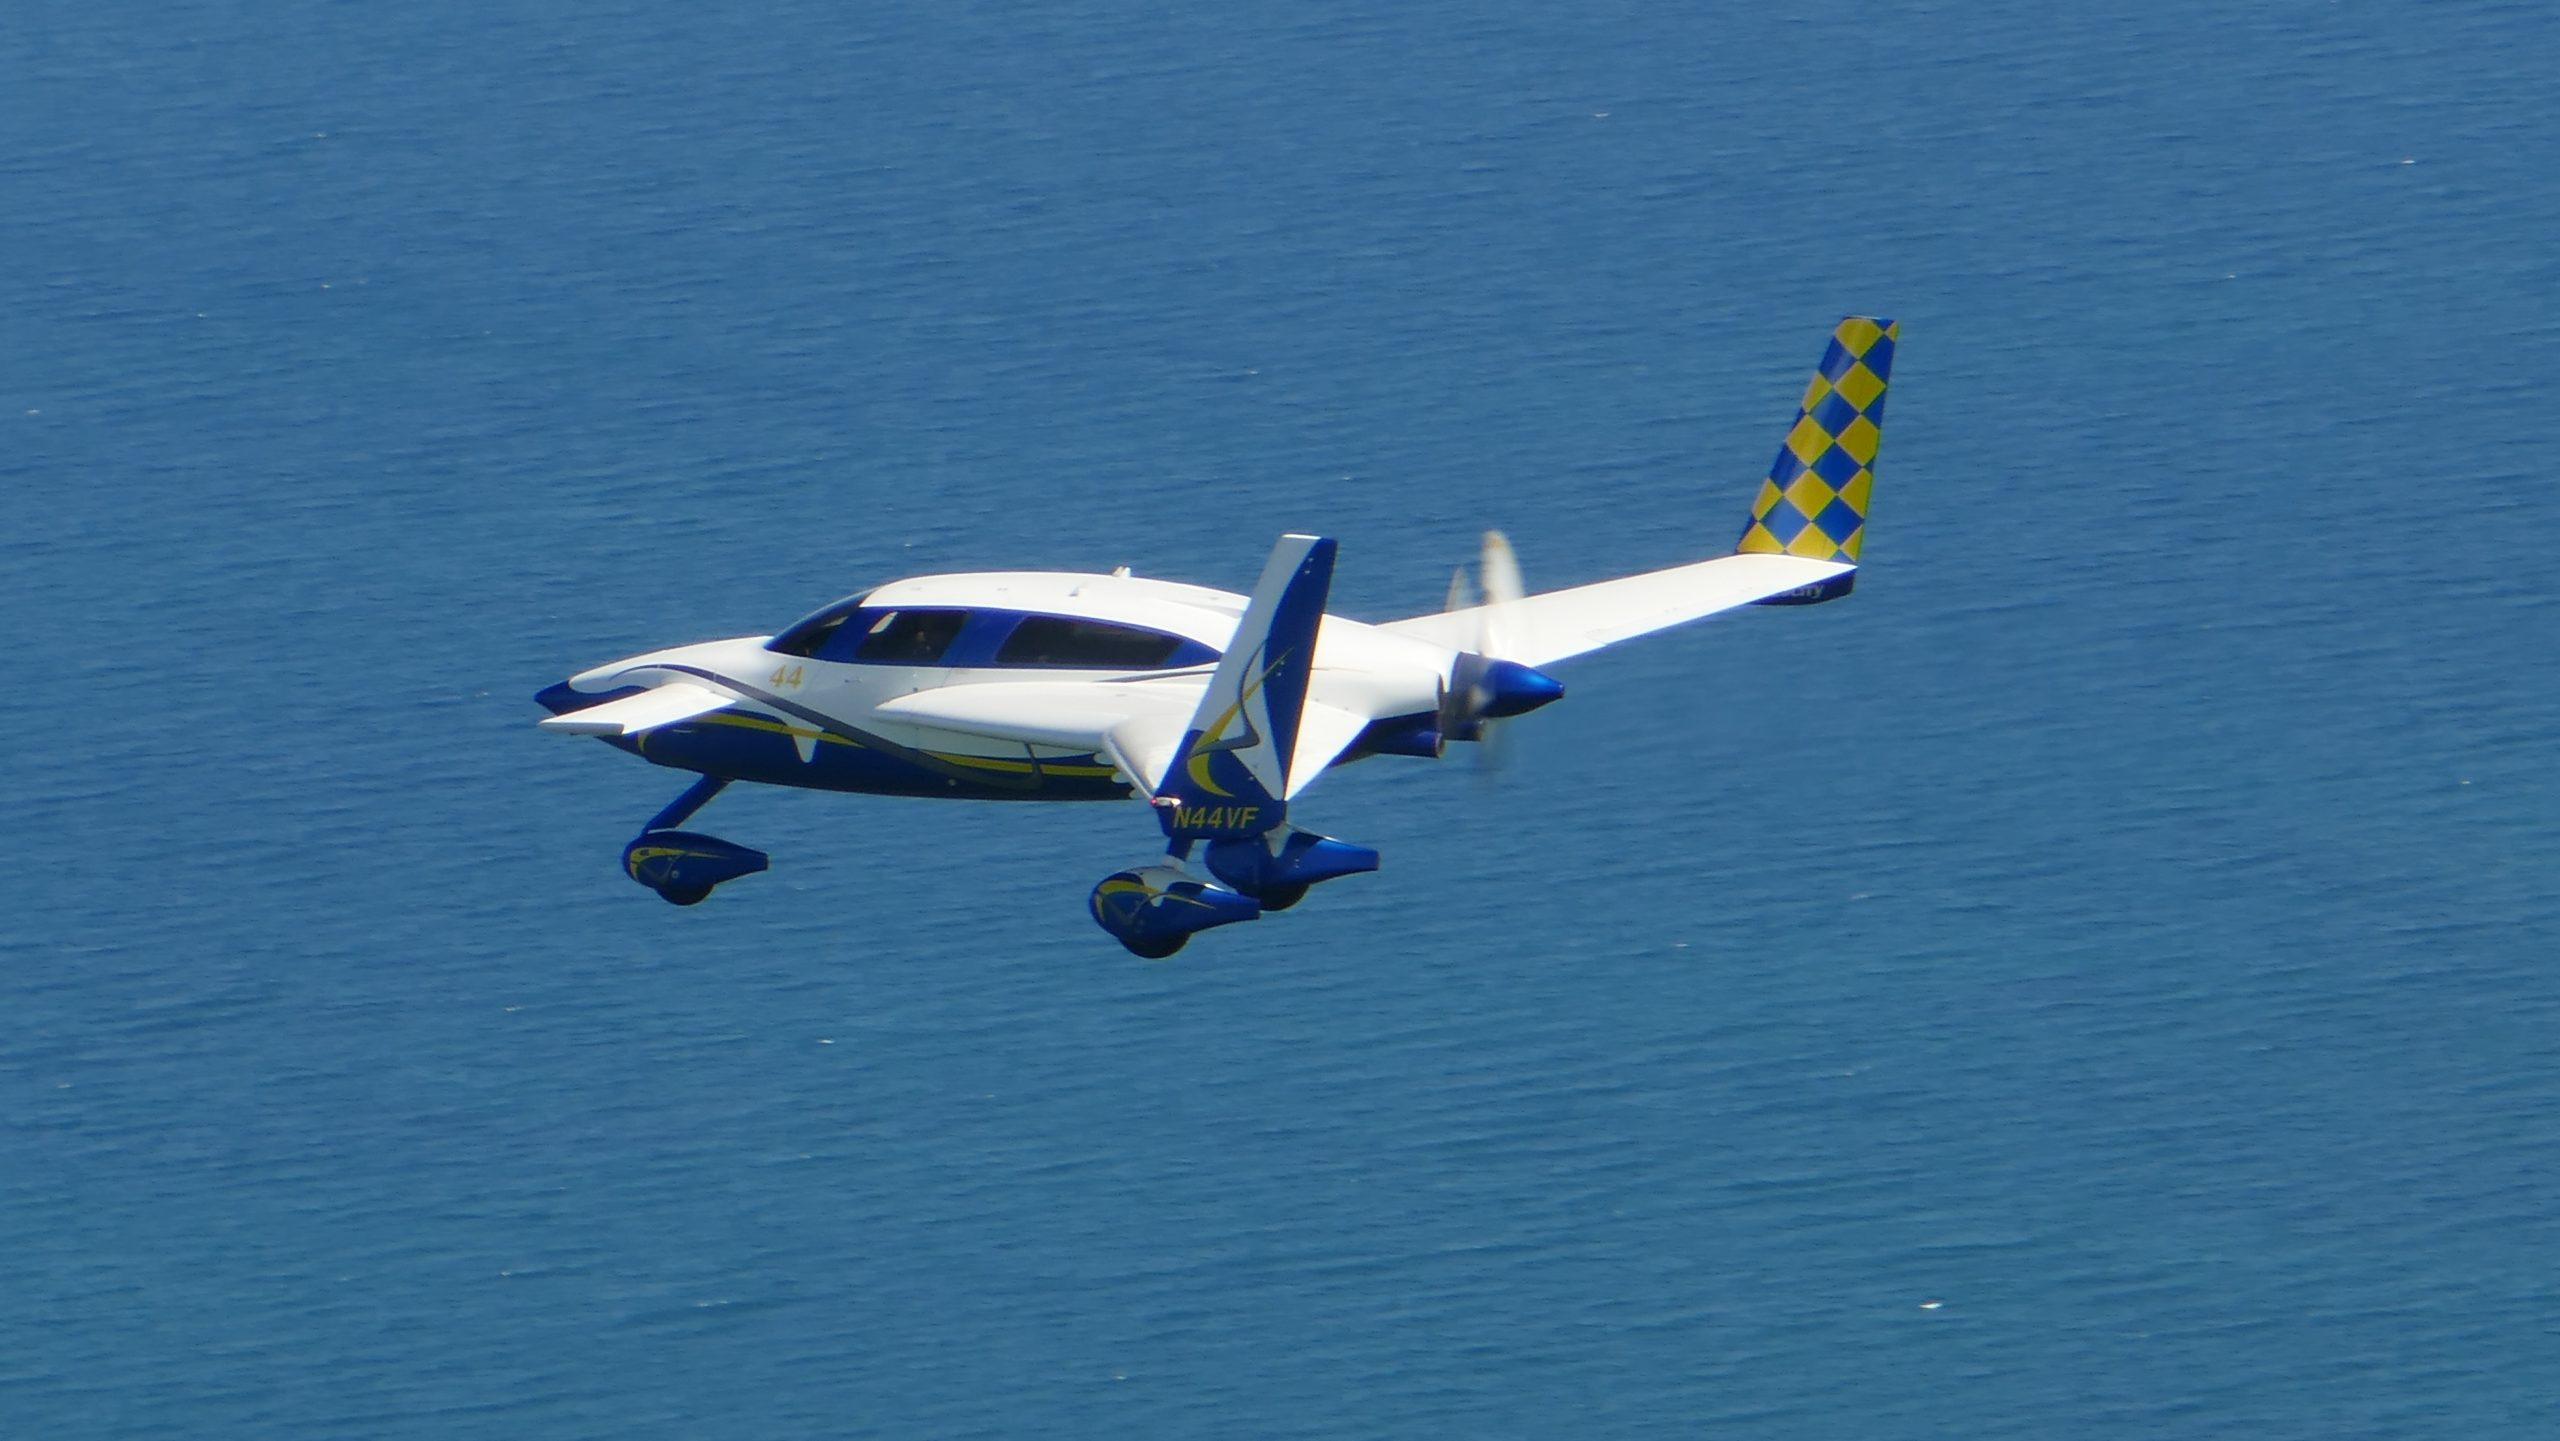 N44VF over Lake Superior